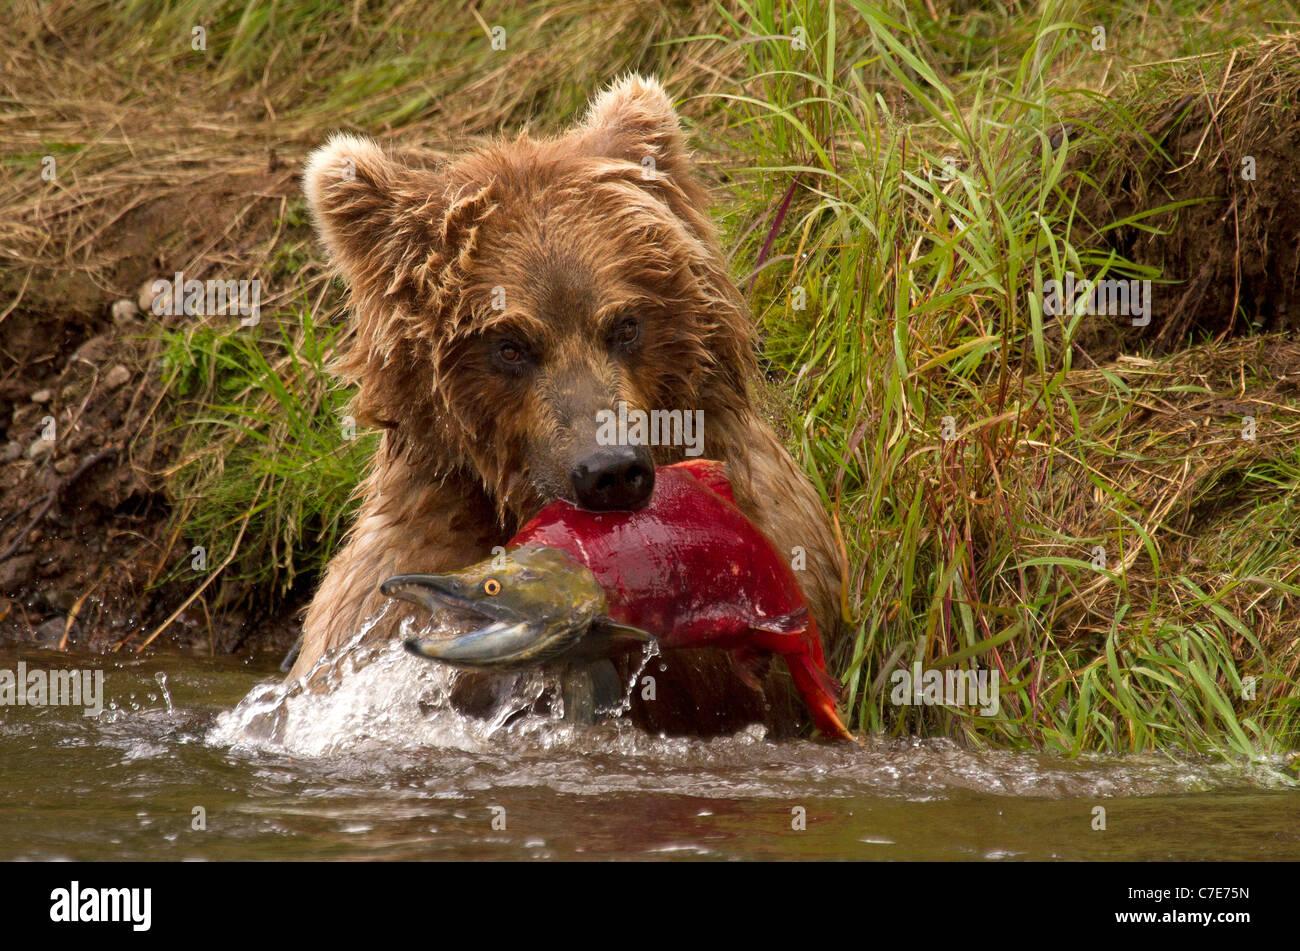 Brown Bear Cub, Ursus arctos arrebata un pez Imagen De Stock